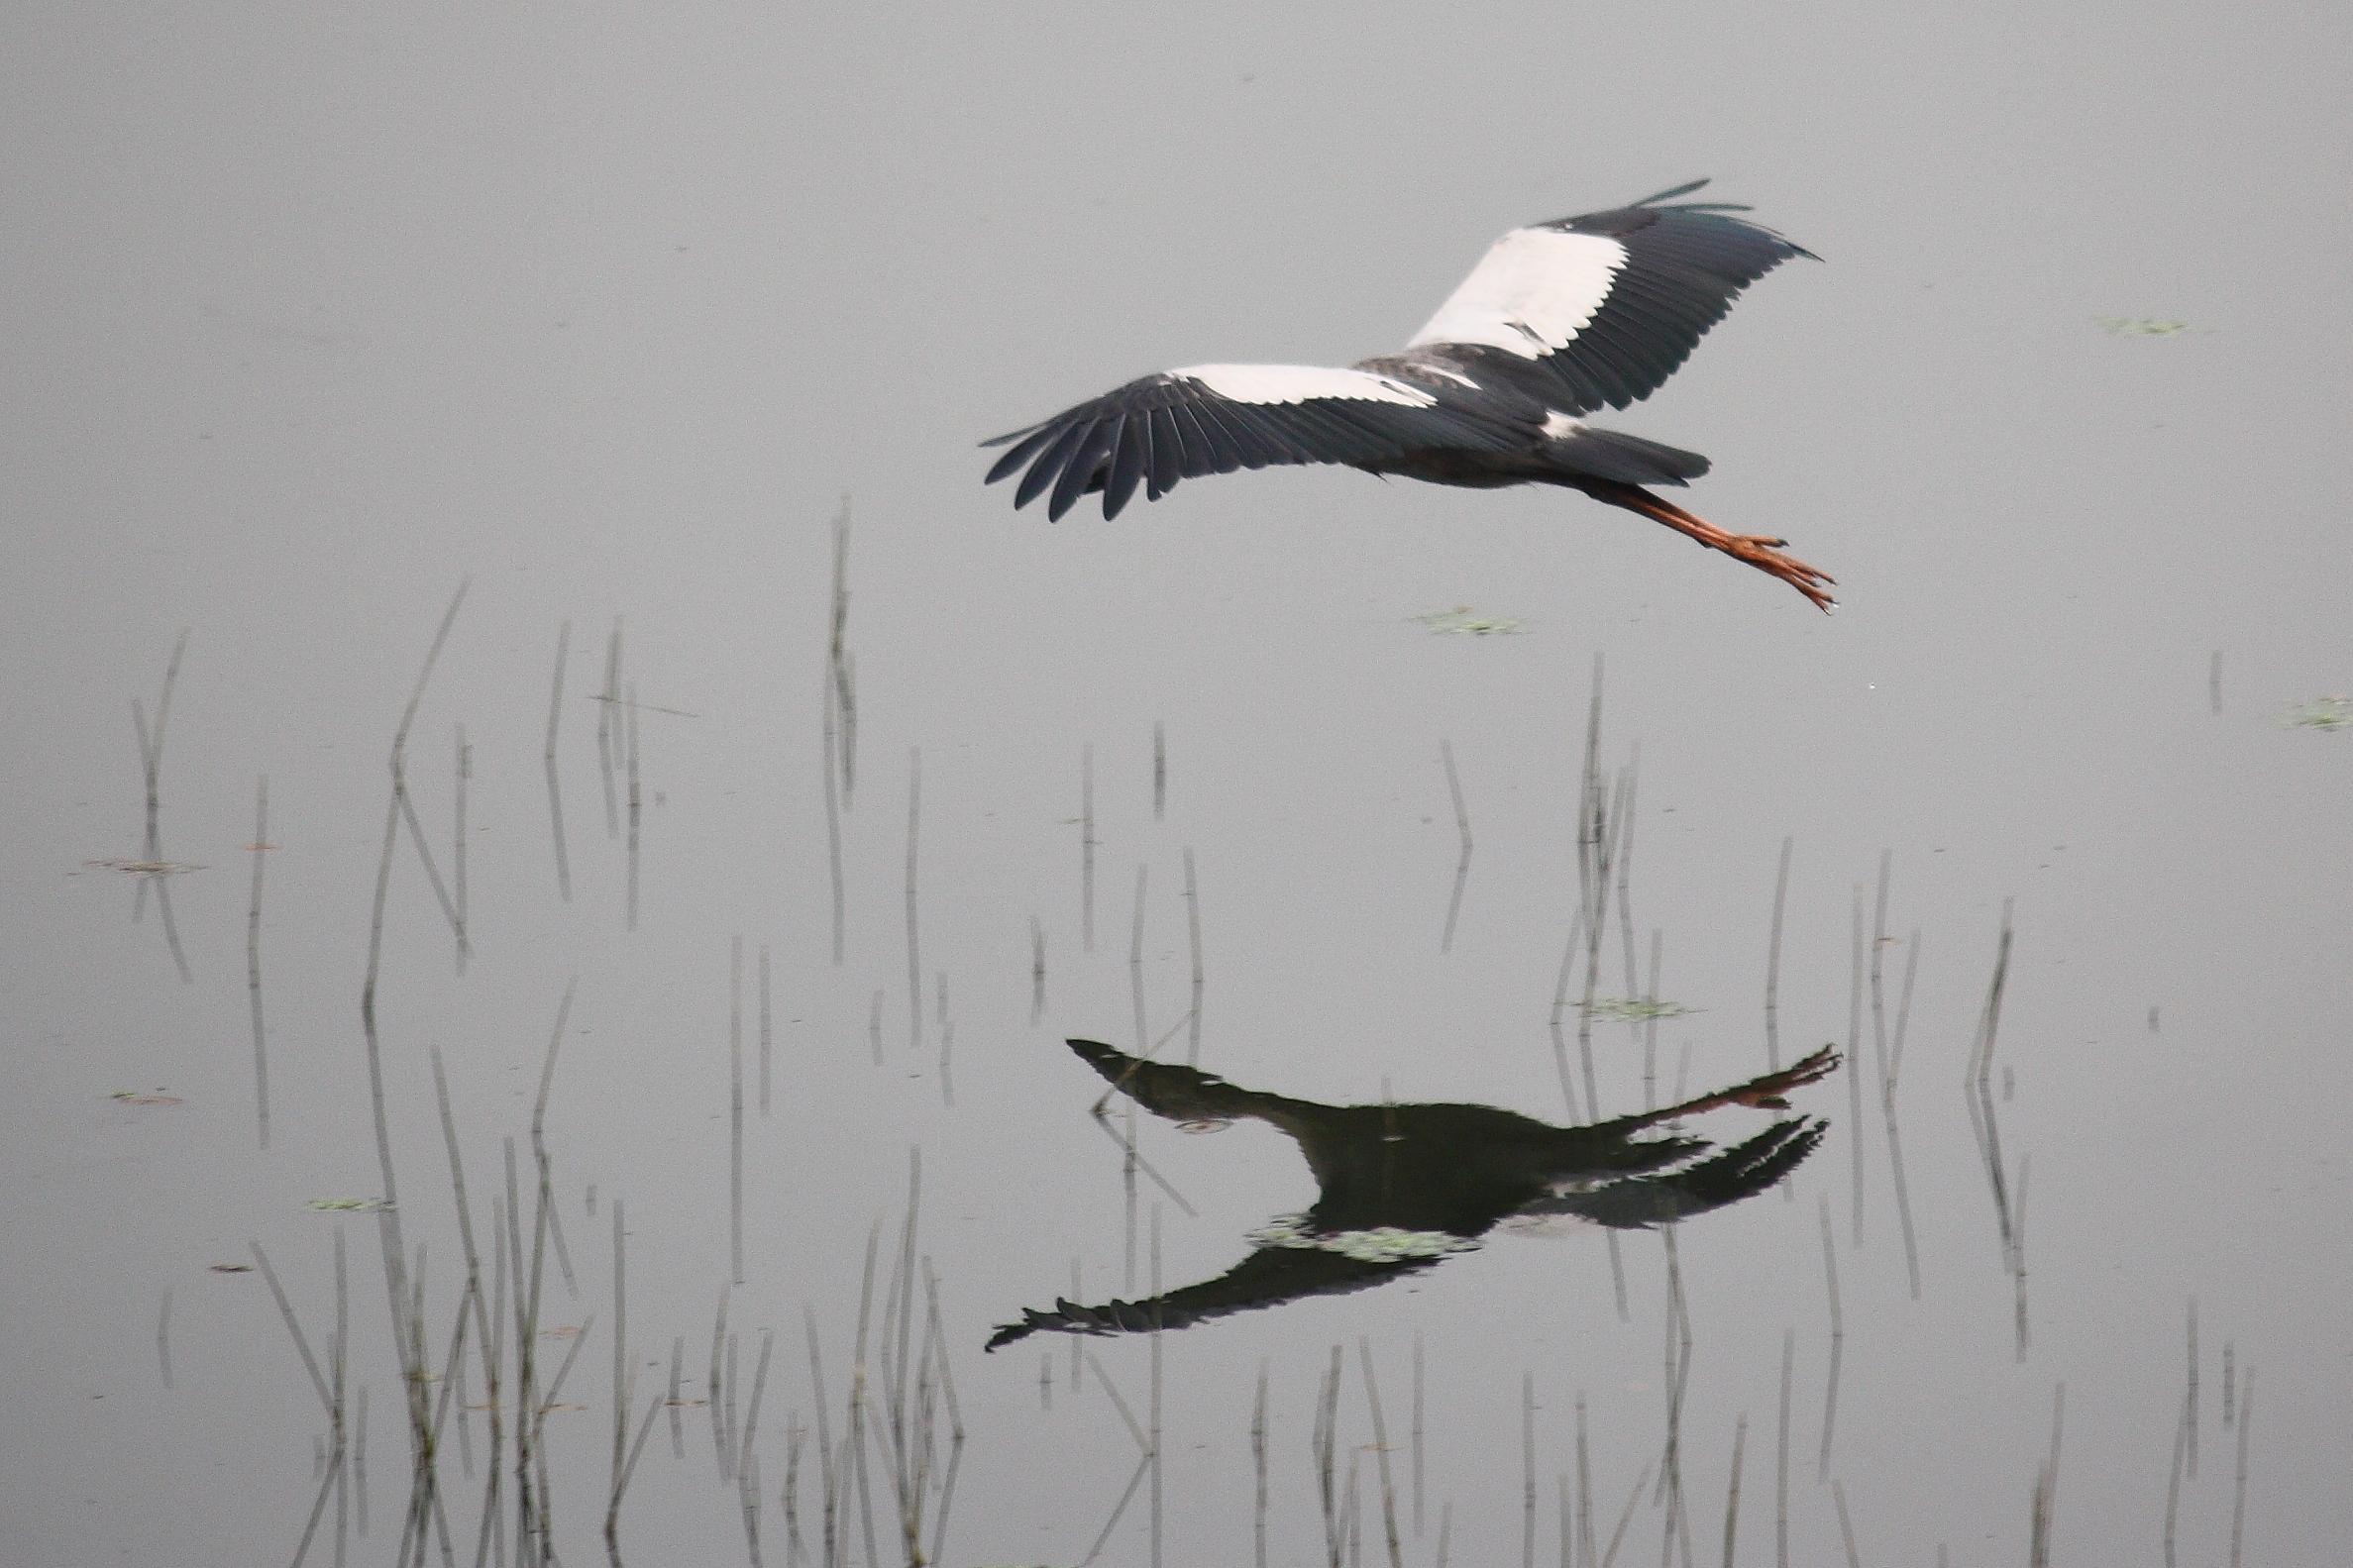 Reflection of flying bird